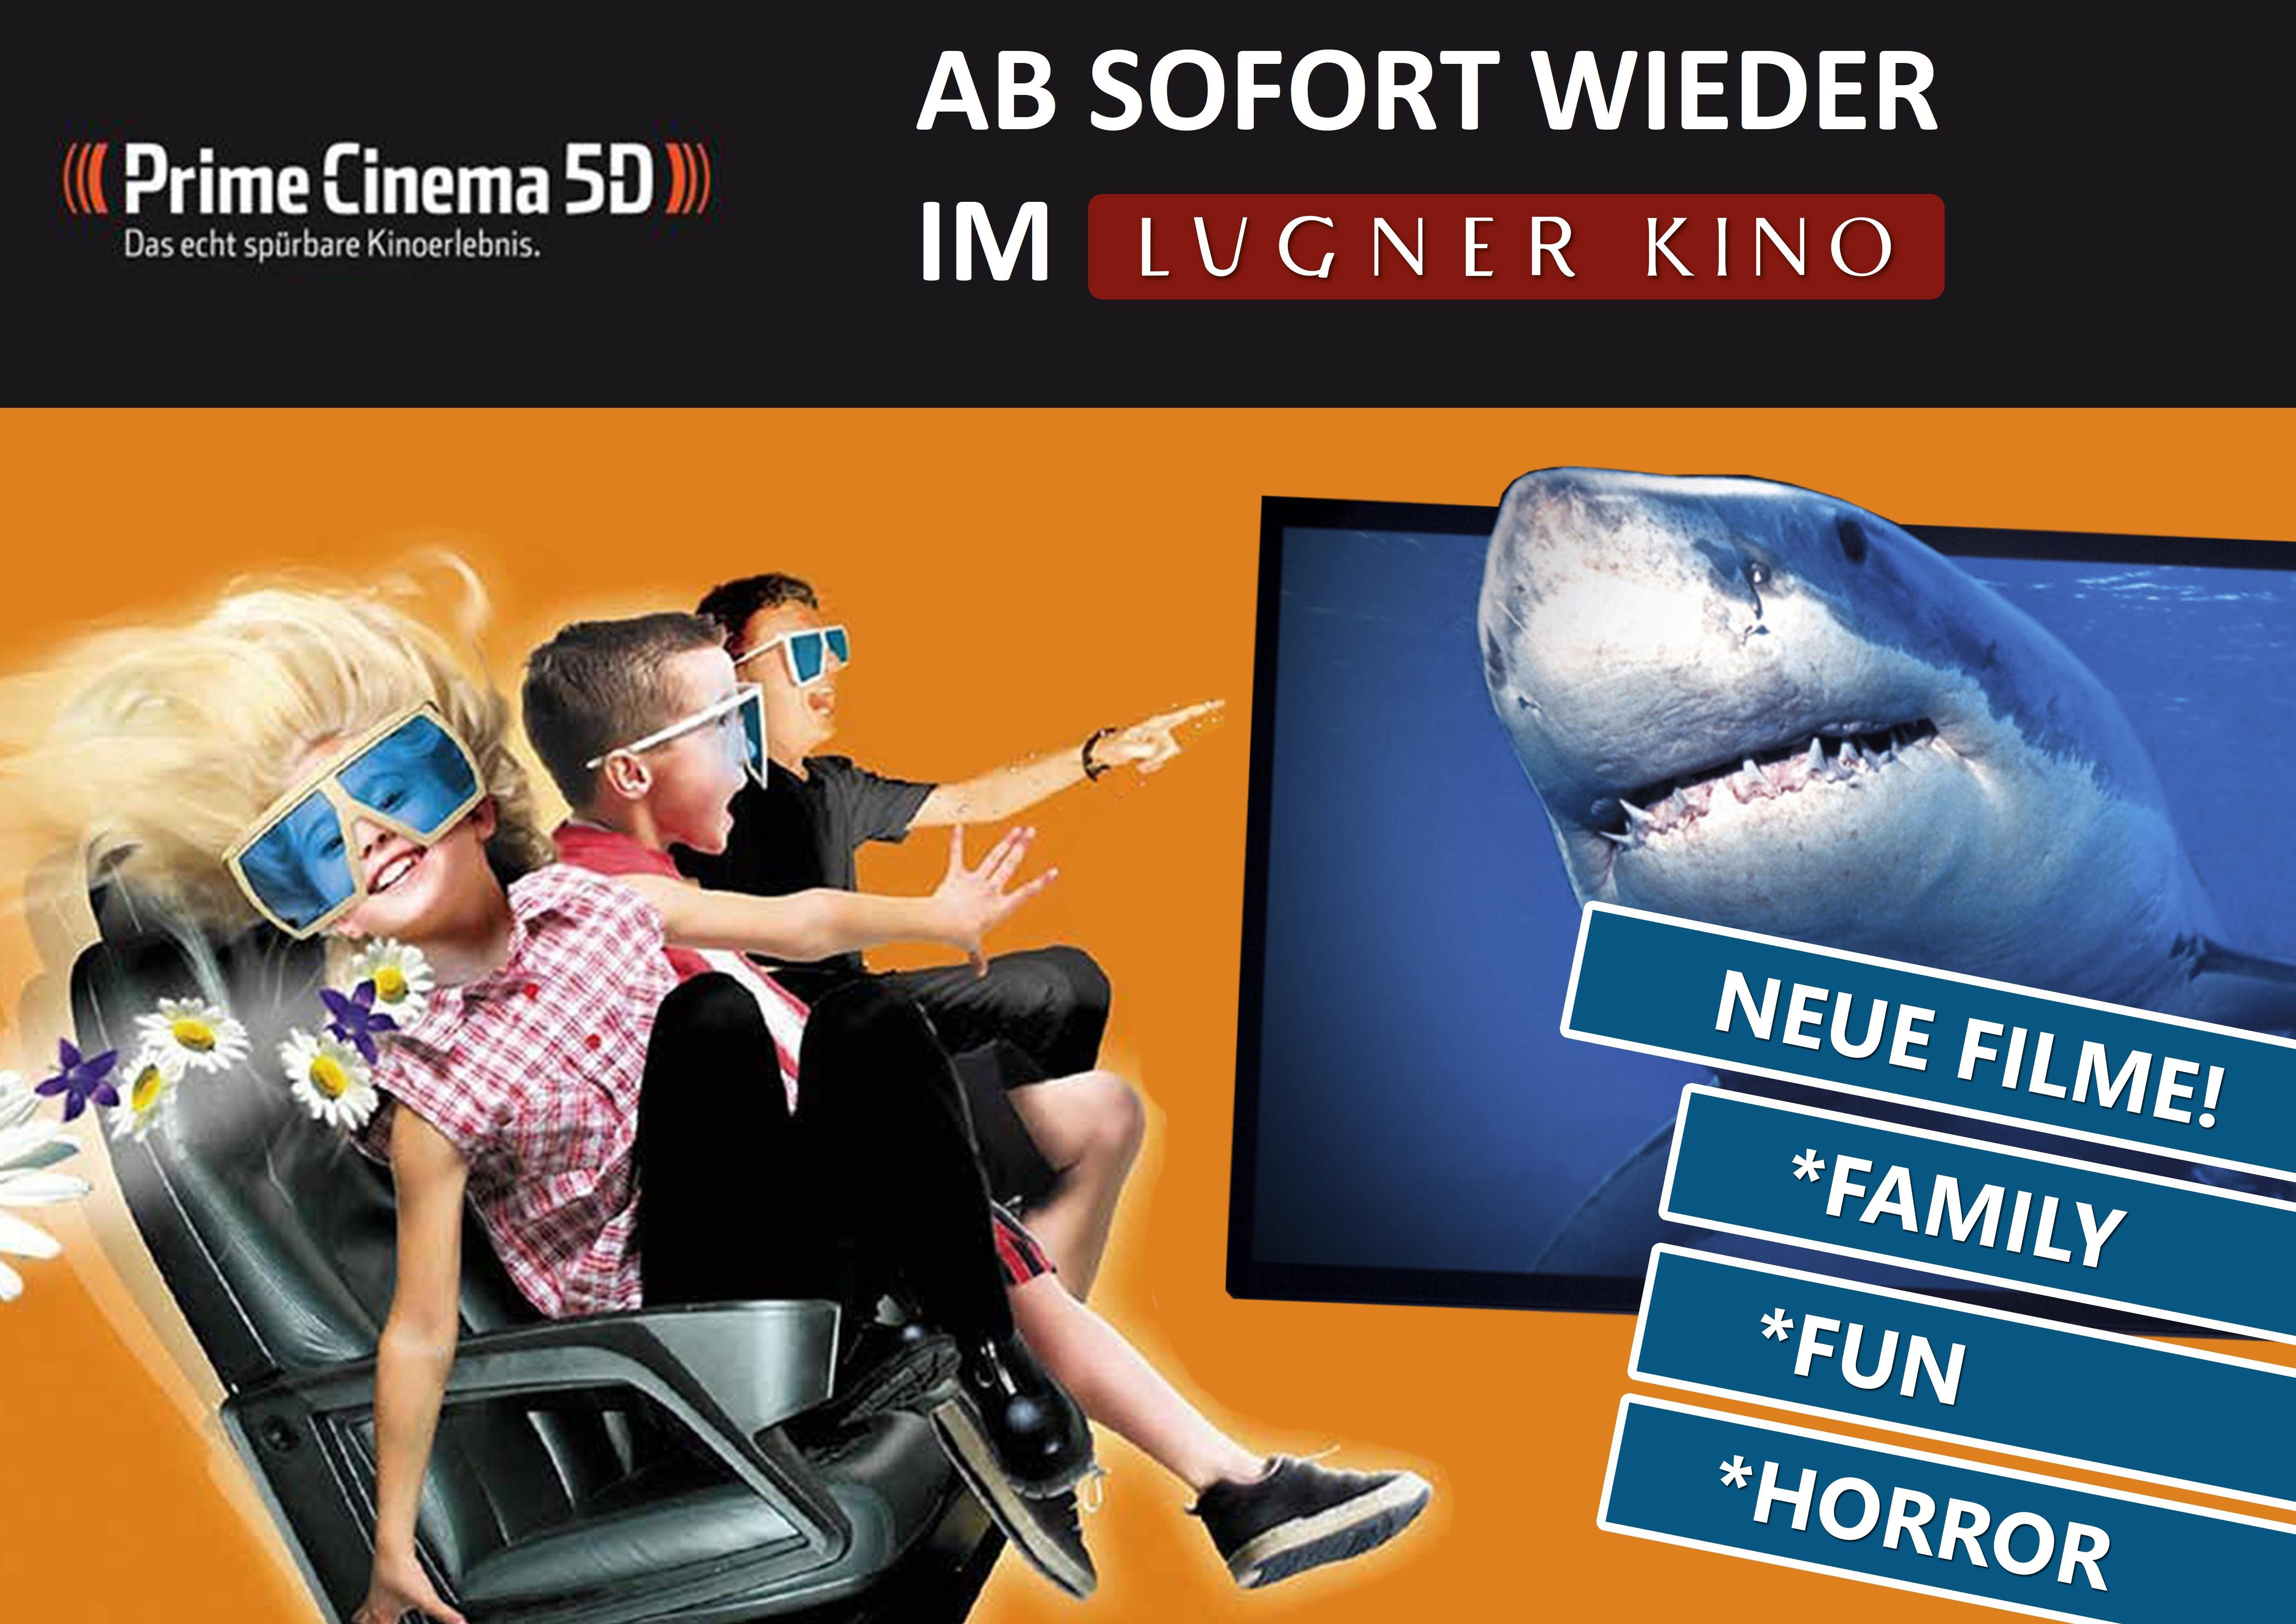 Spielplan Lugner Kino